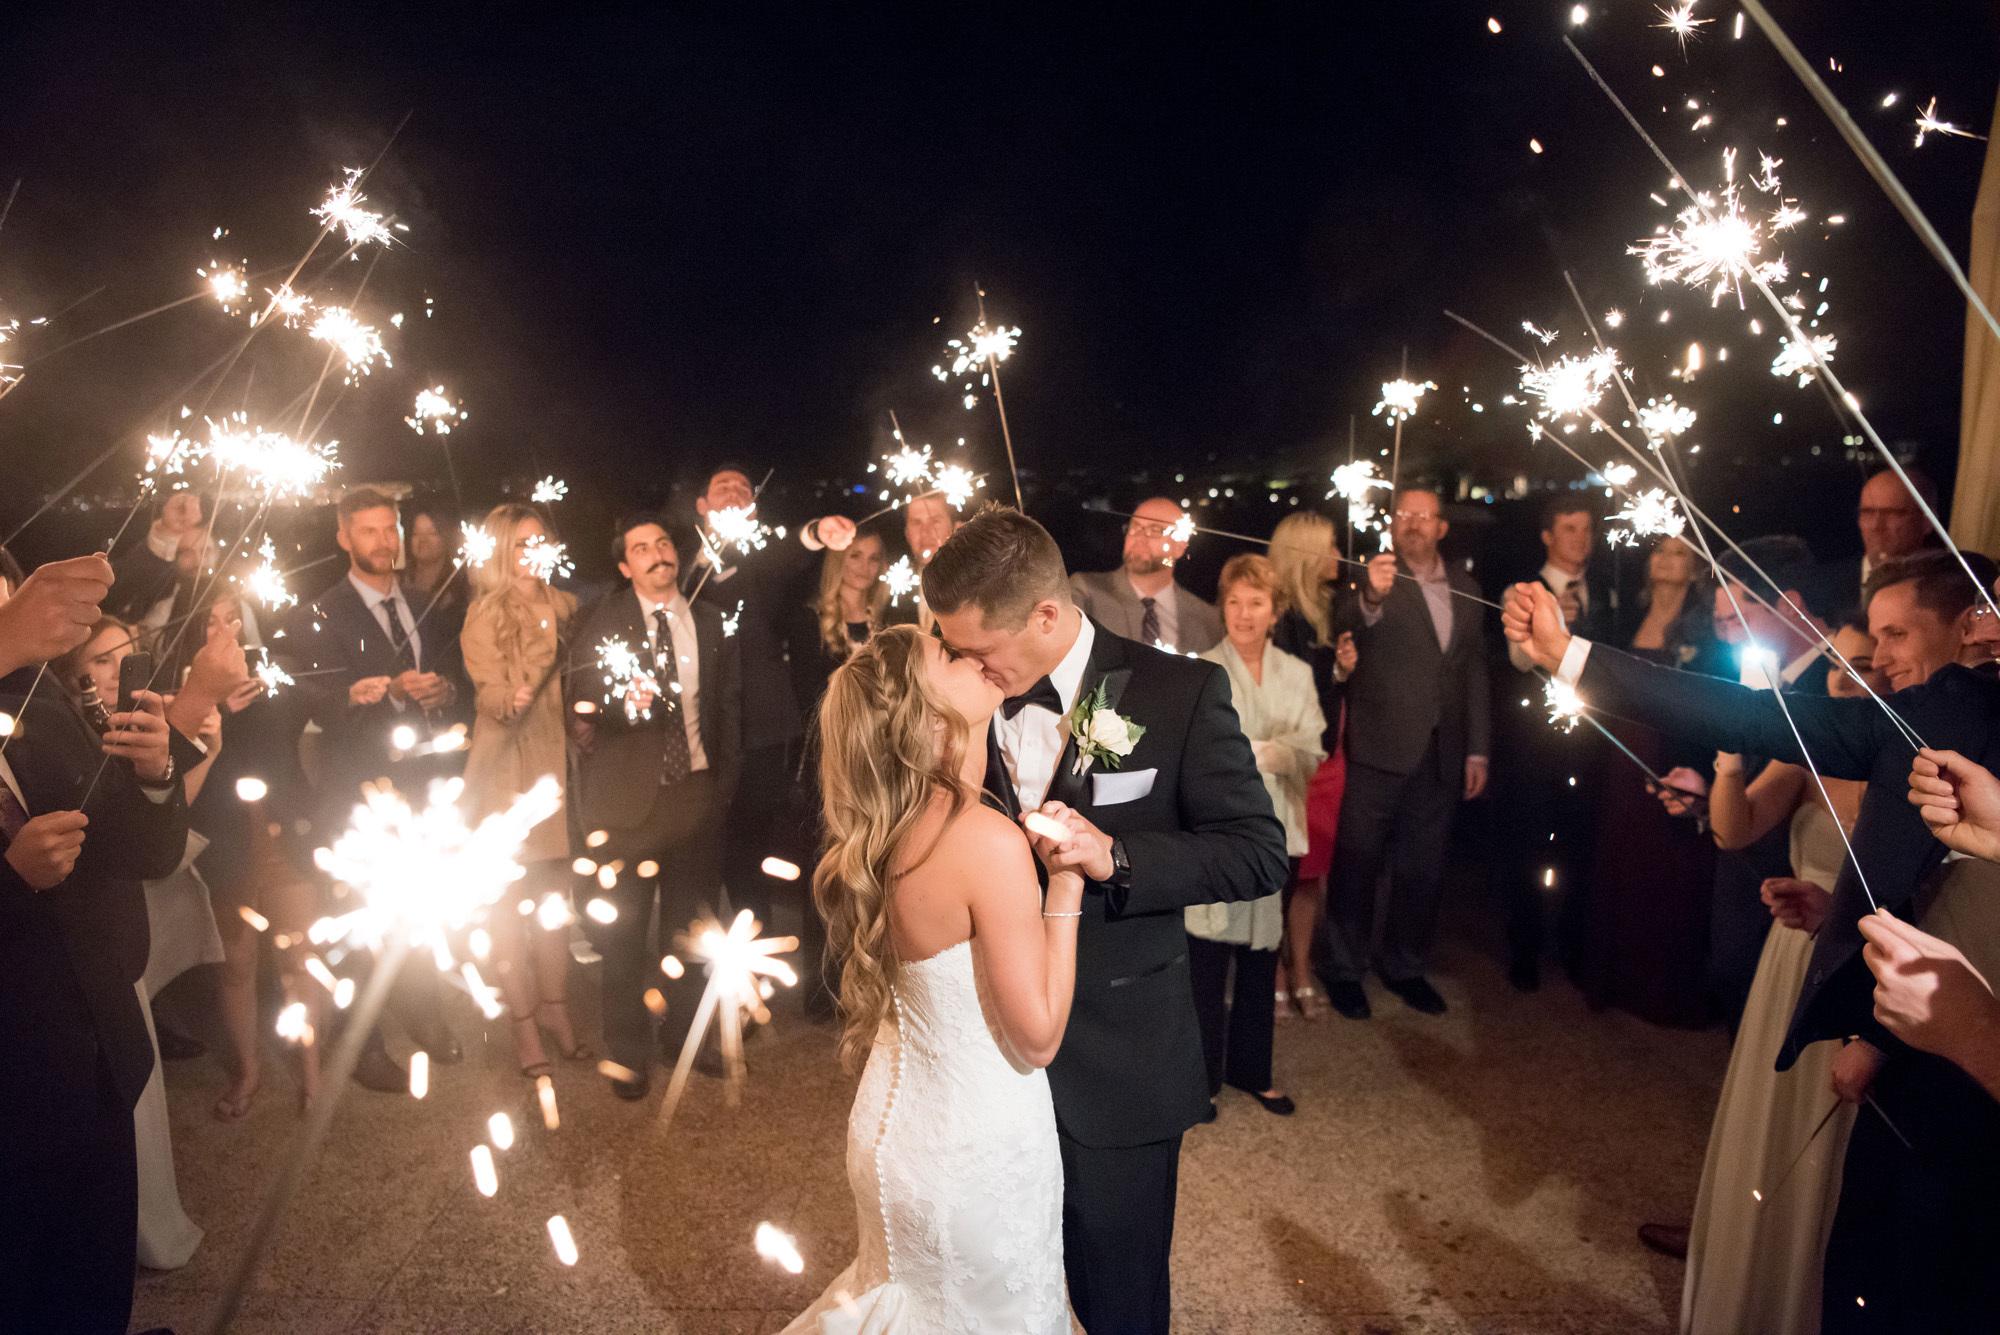 las vegas wedding planner angelica rose events wedding sparklers.jpg